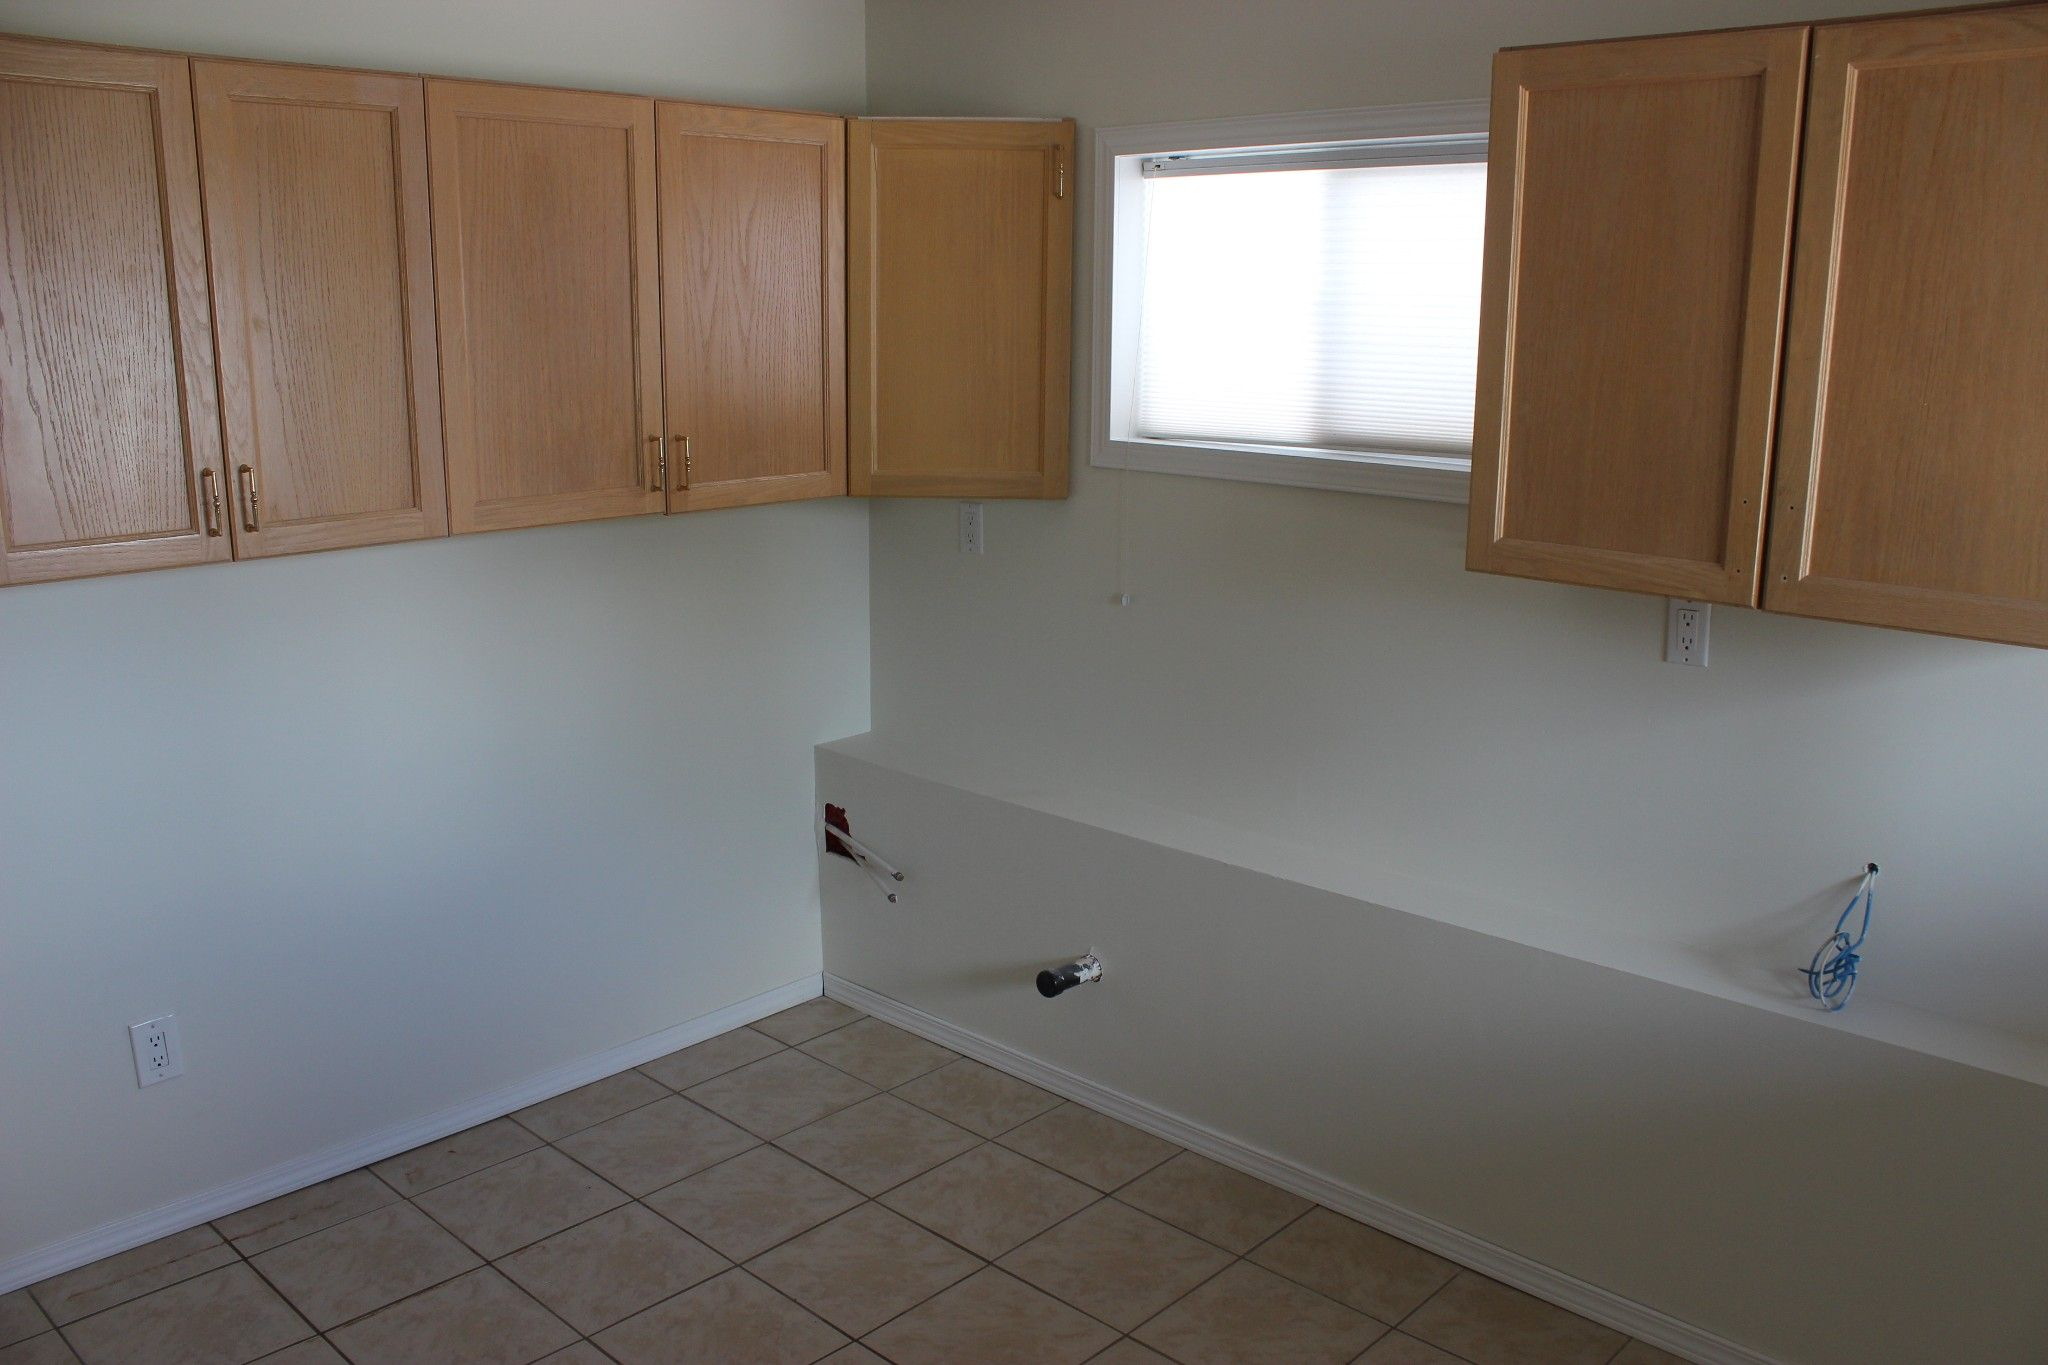 Photo 17: Photos: 317 Waddington Drive in Kamloops: Sahali 1/2 Duplex for sale : MLS®# 161942